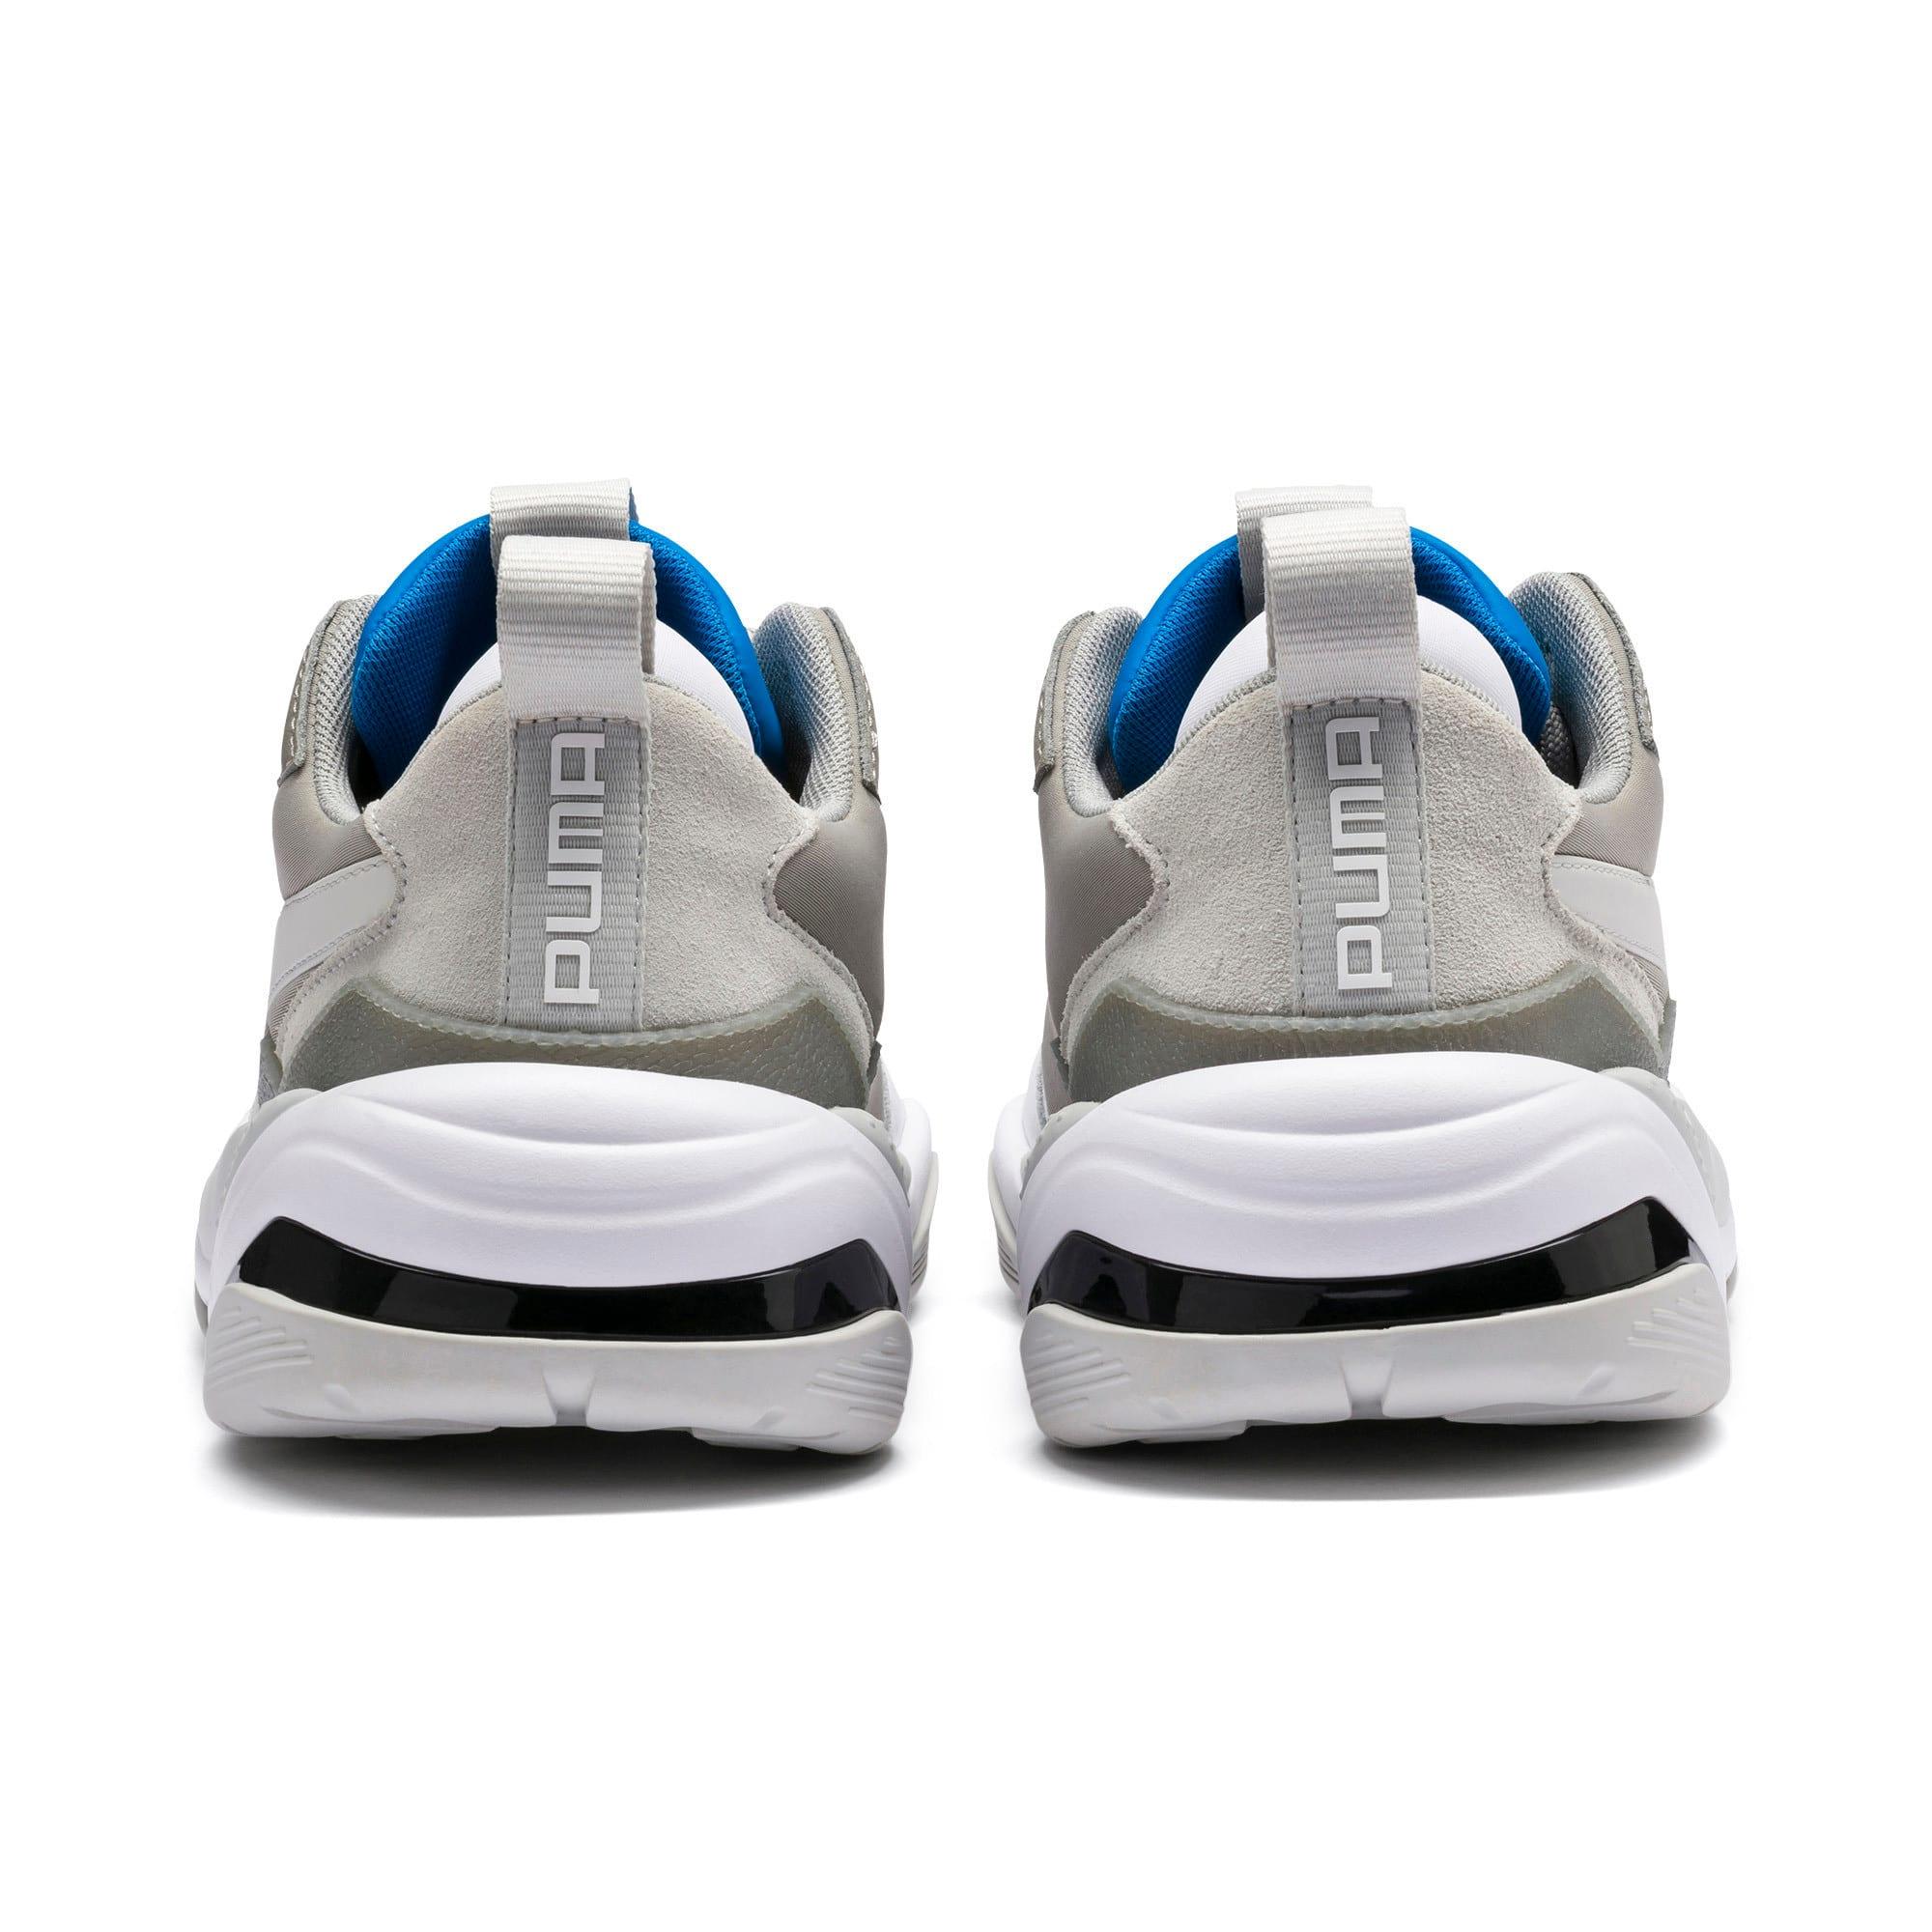 Thumbnail 3 of Thunder Spectra Sneakers, Glacier Gray-Indigo Bunting, medium